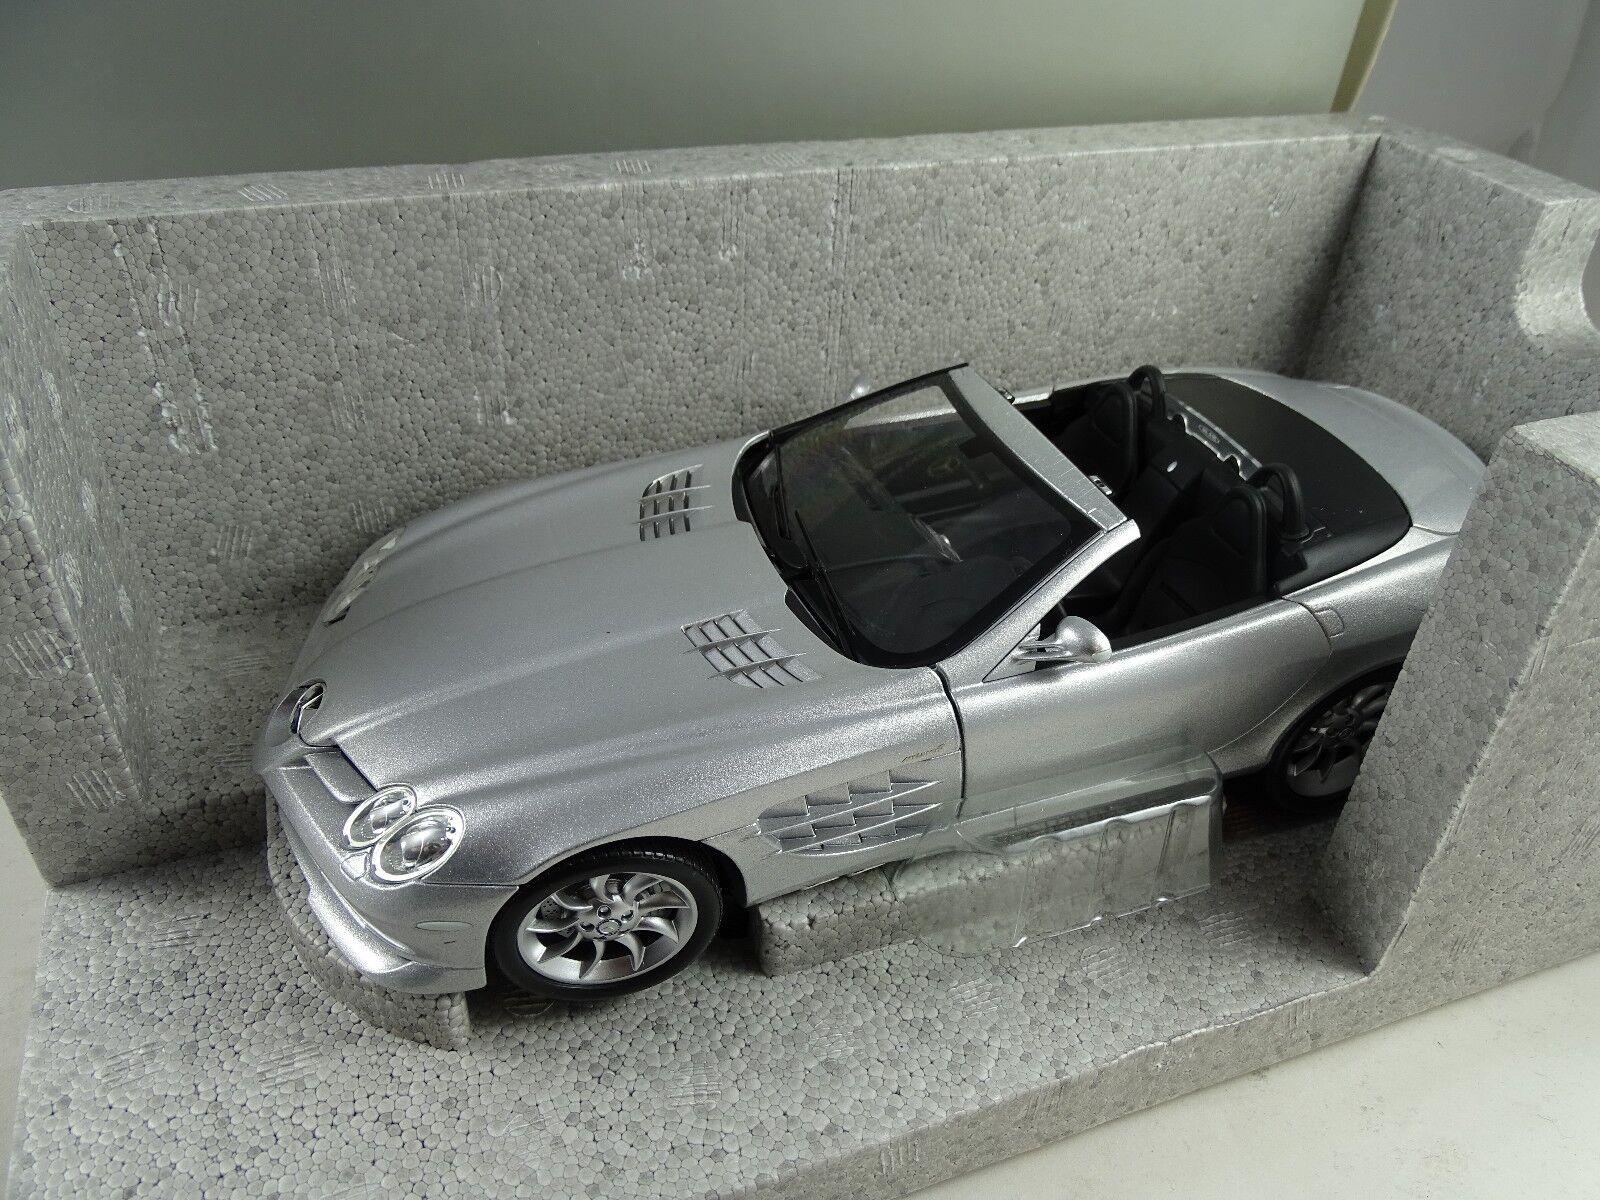 1 18 Dealermodell  B66961003 Mercedes Benz SLR Mc Laren Roadster Rarity